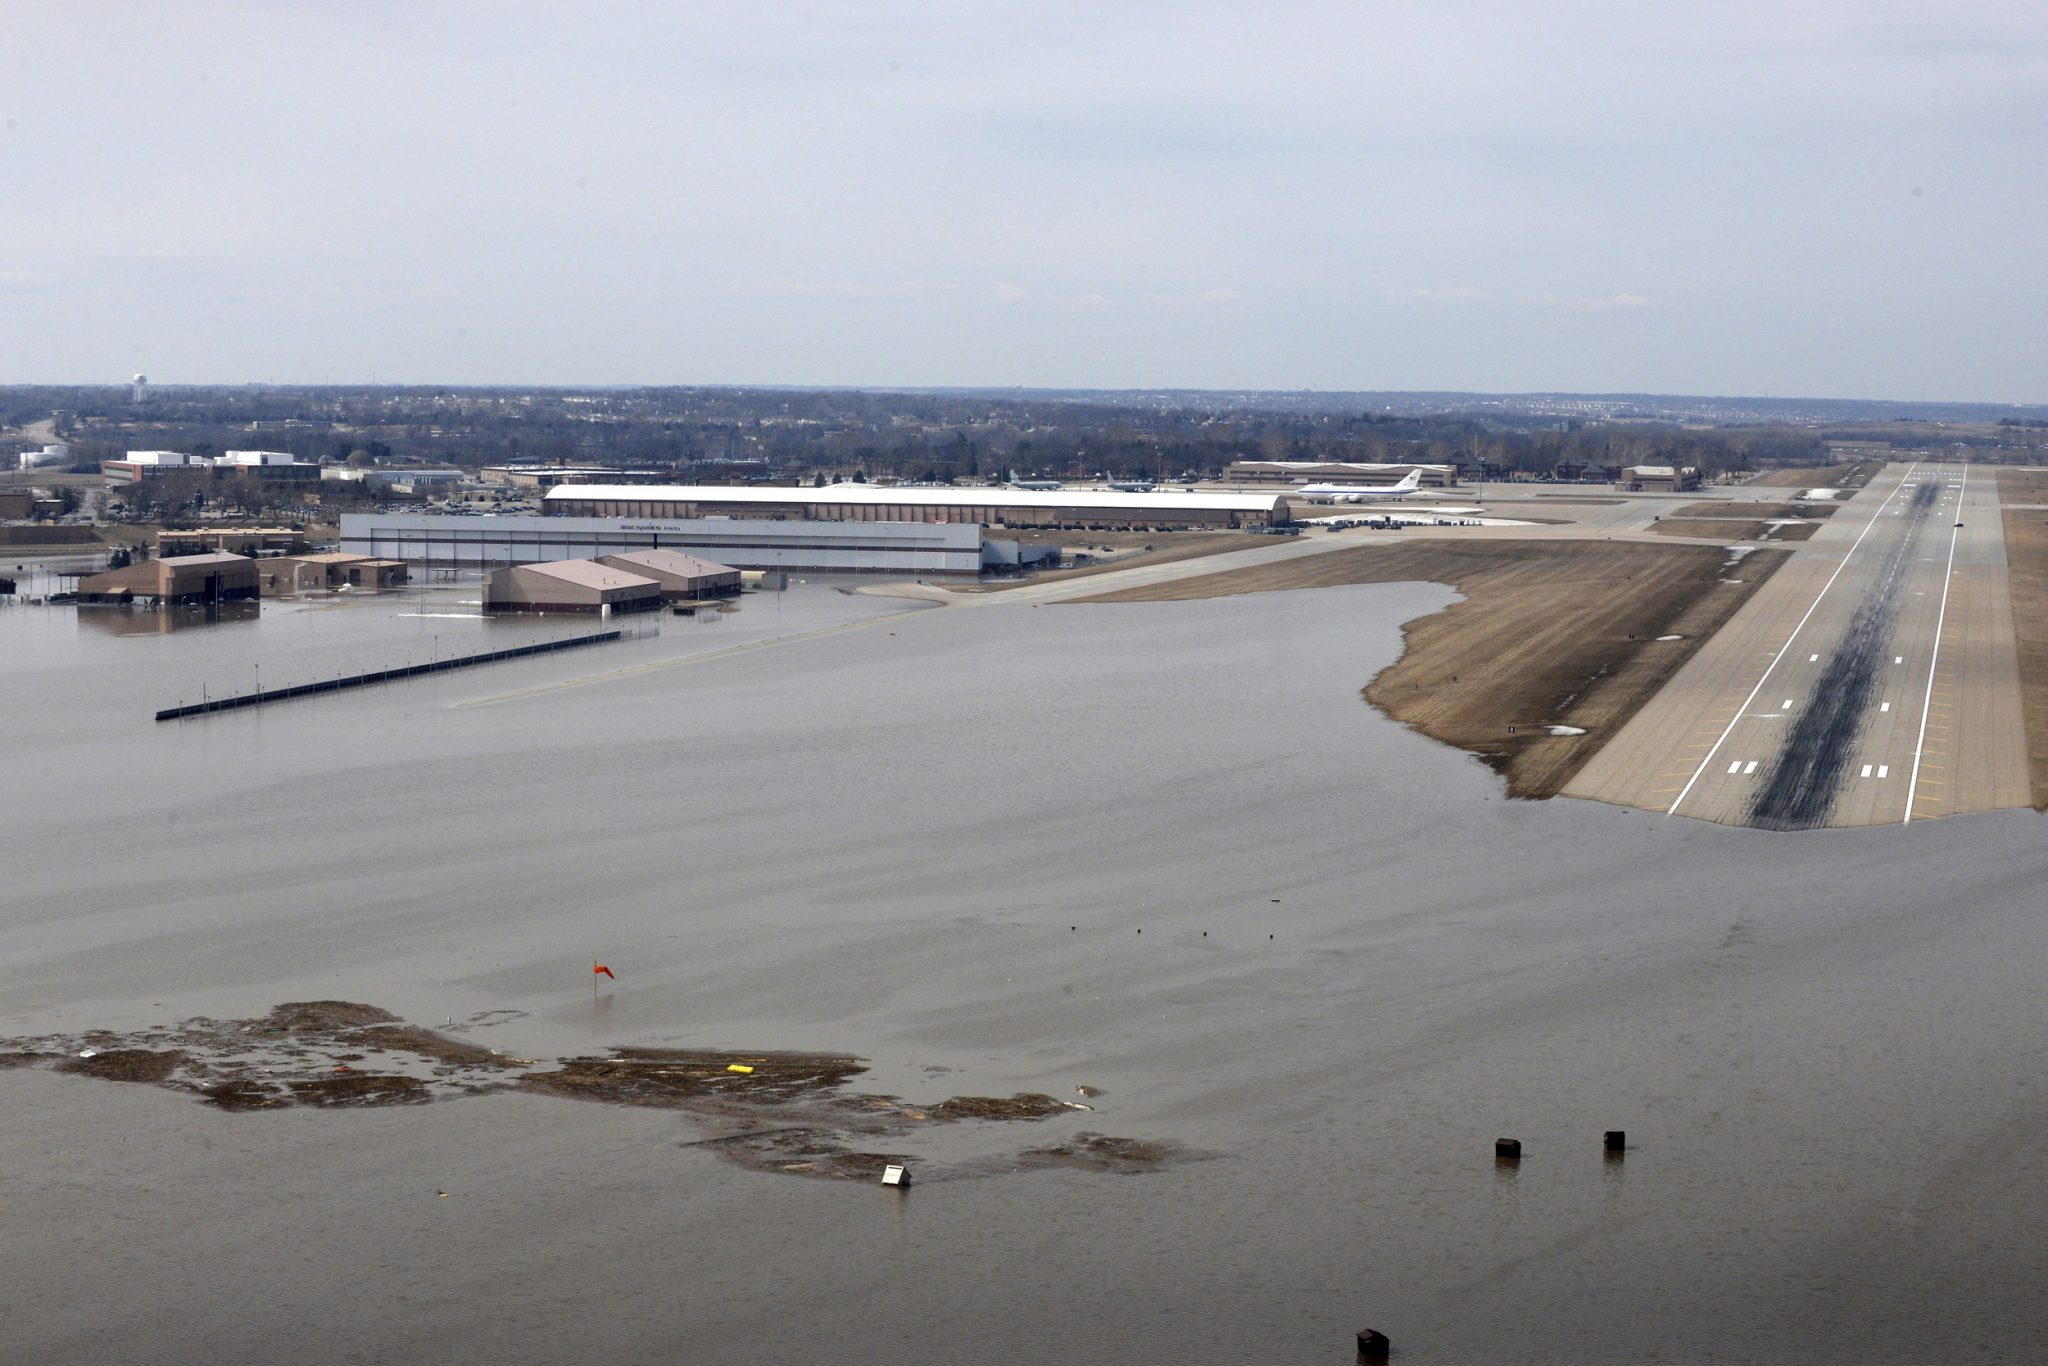 Flooding Prompts Criticism Of Way Missouri River Dams Run